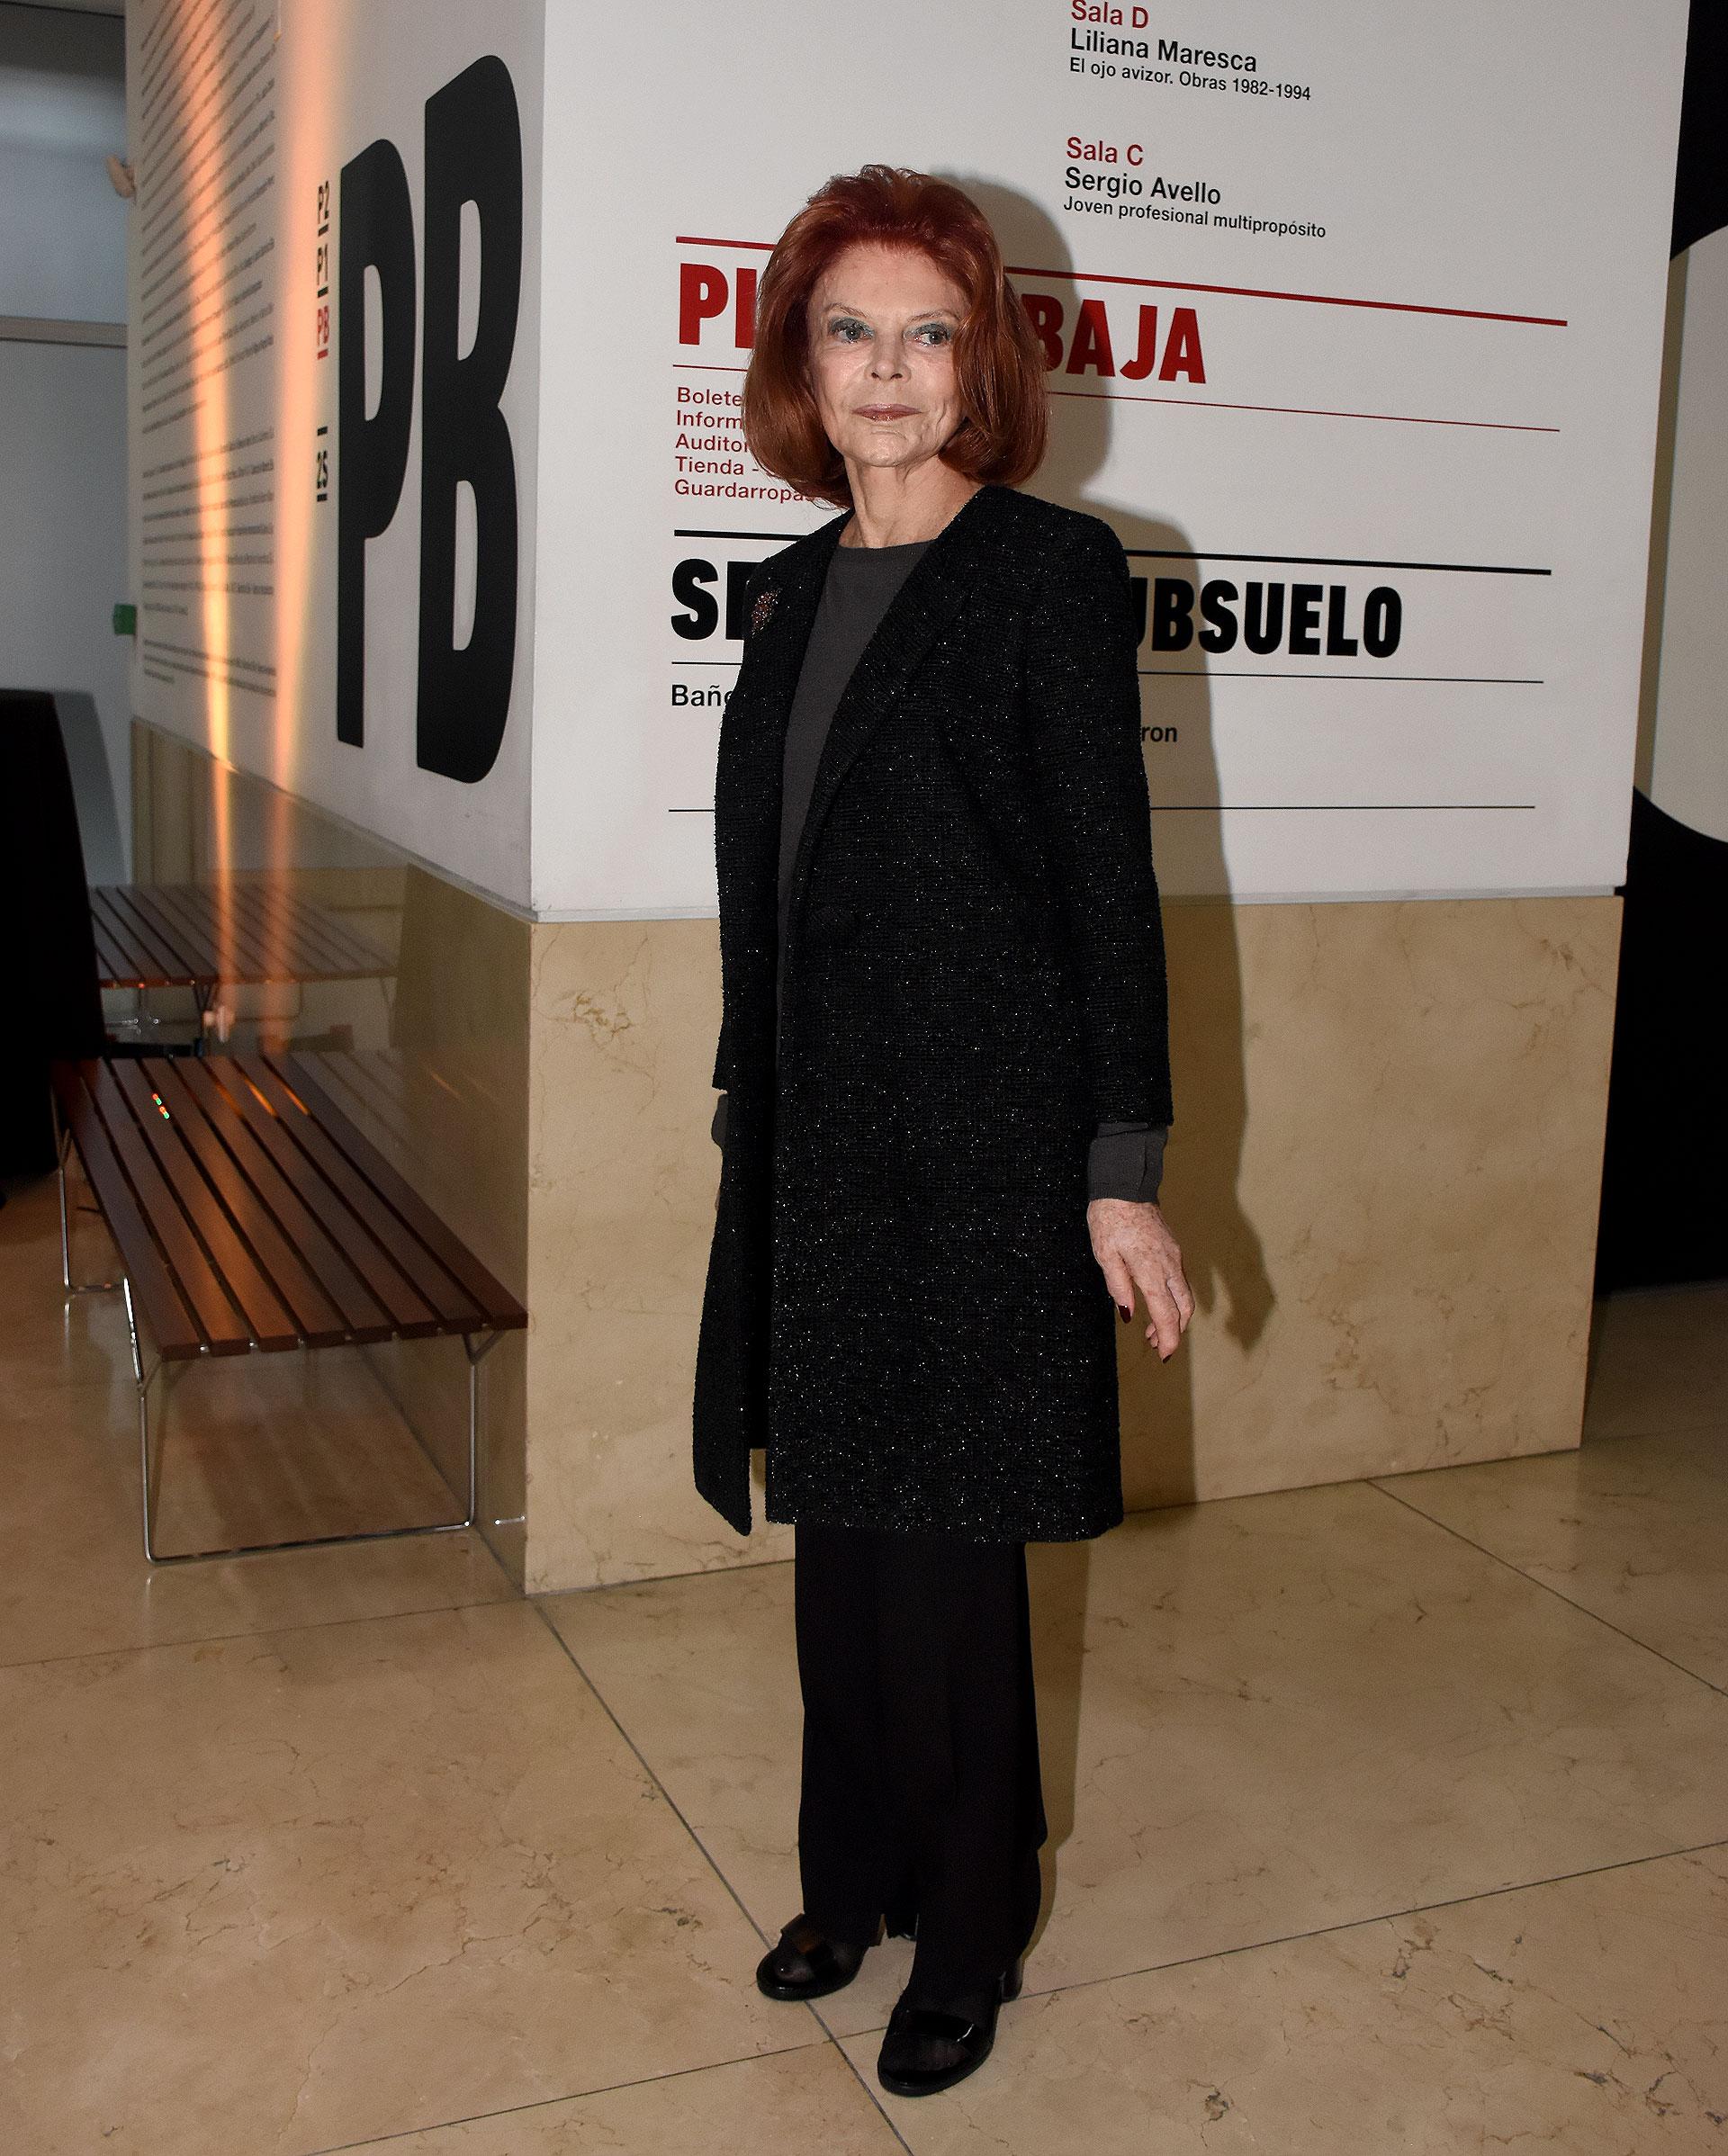 Lili Sielecki